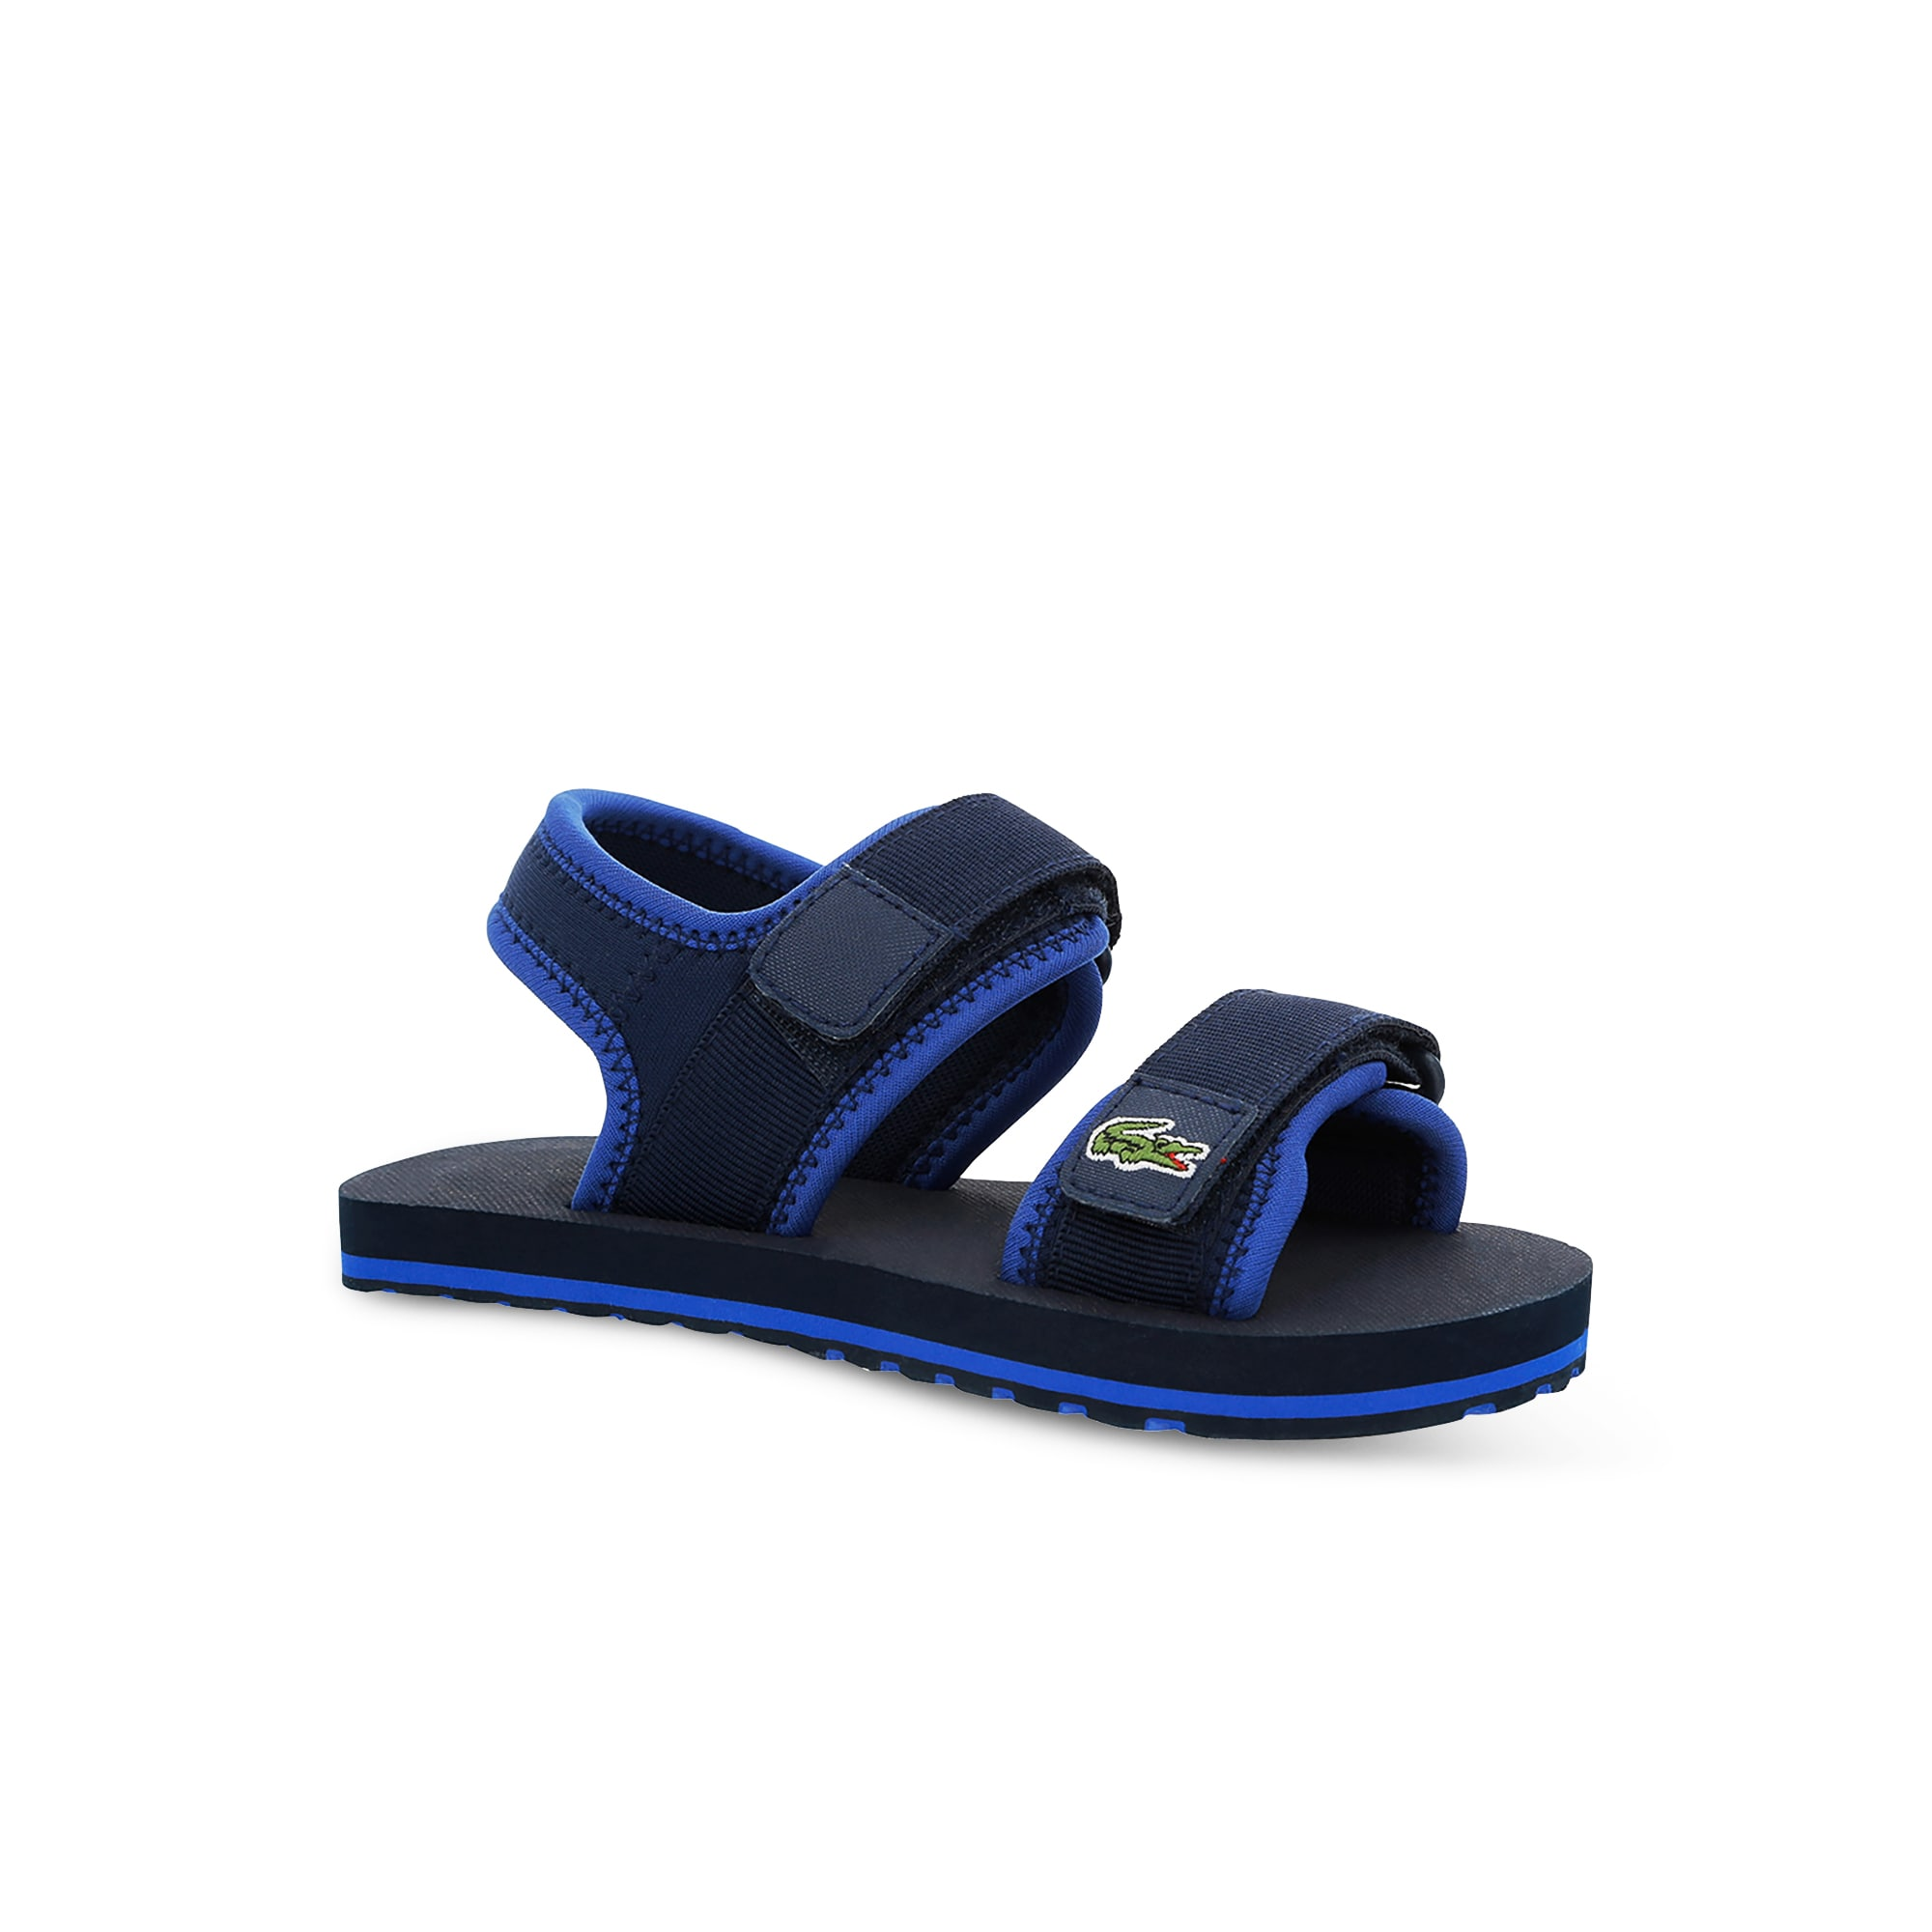 2161d73160 Chaussures Fille | Chaussures Enfant | LACOSTE